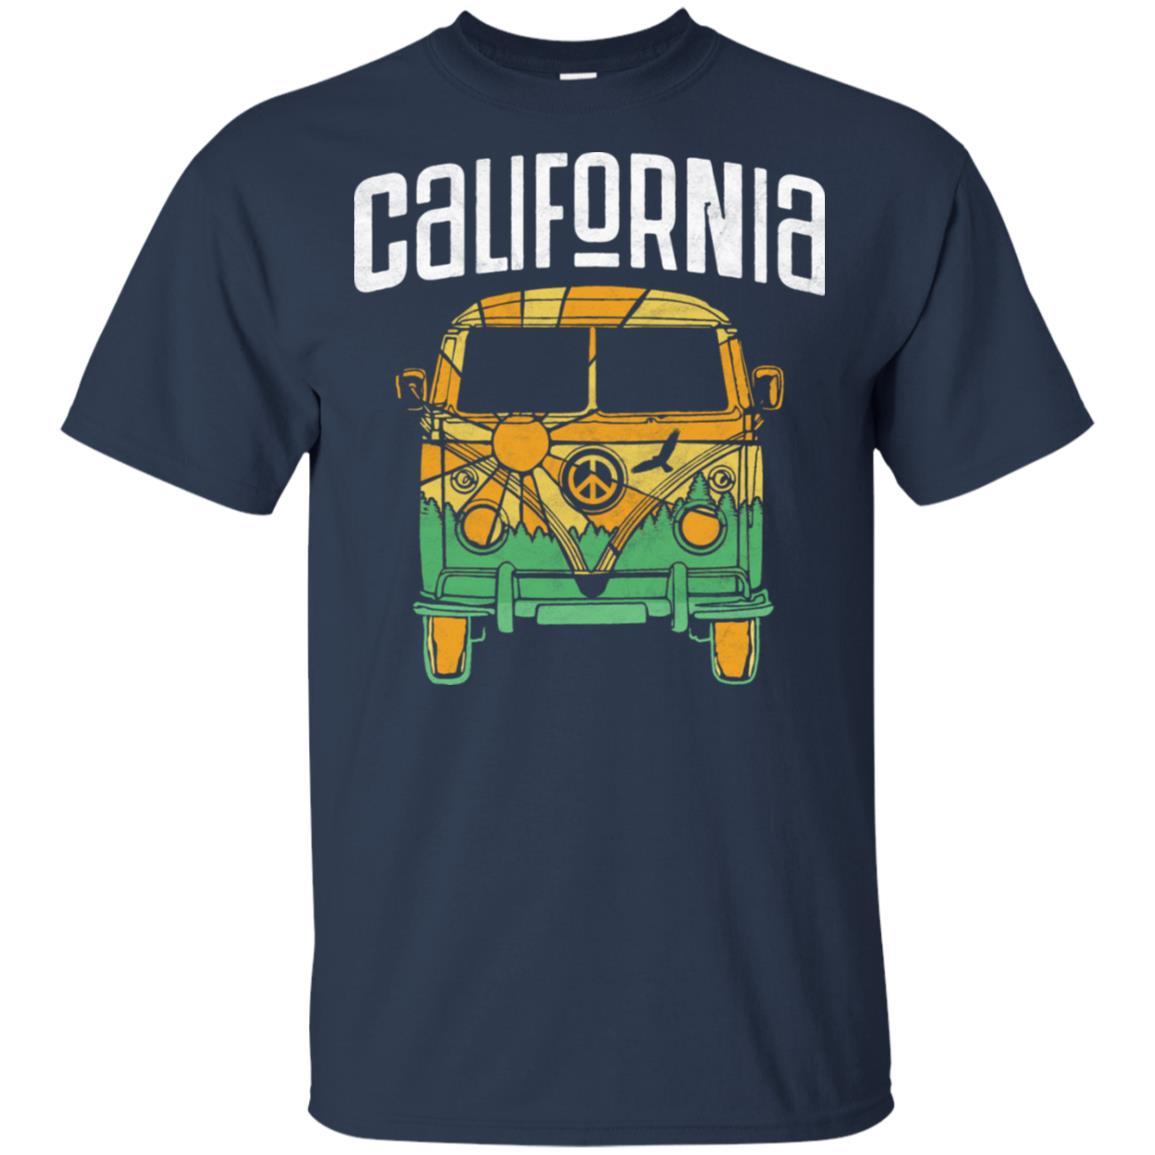 Retro California Hippie Van Camper Nature Tee Unisex Short Sleeve